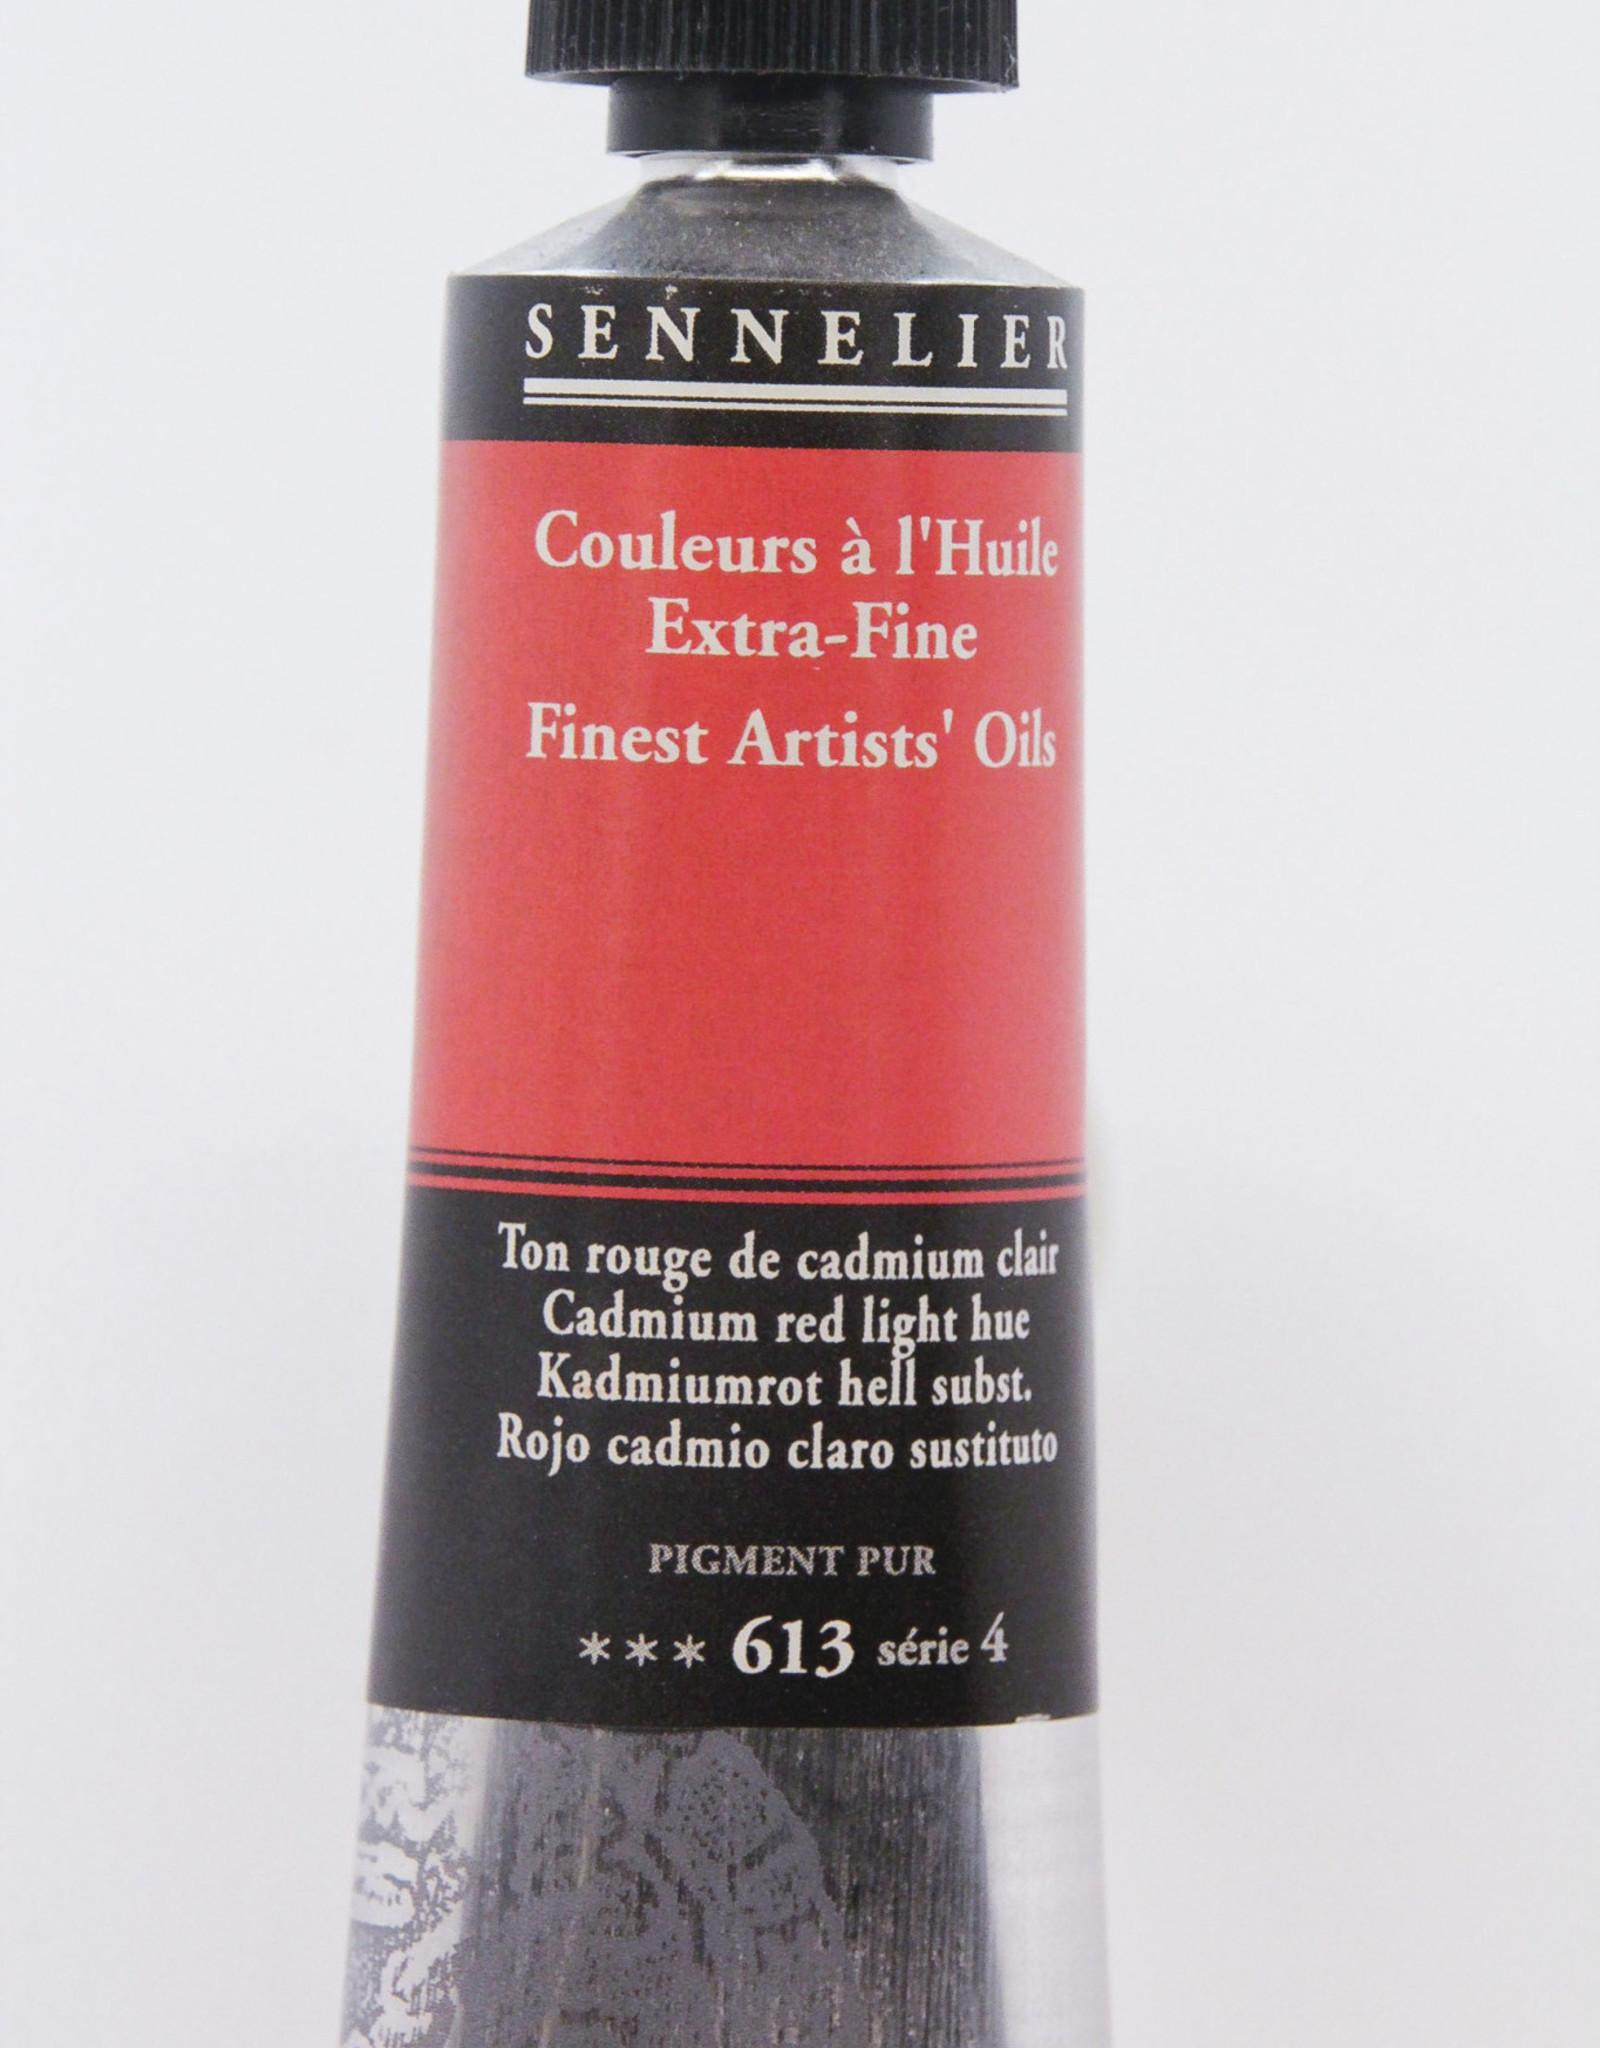 Sennelier, Fine Artists' Oil Paint, Cadmium Red Light Hue, 613, 40ml Tube, Series 4